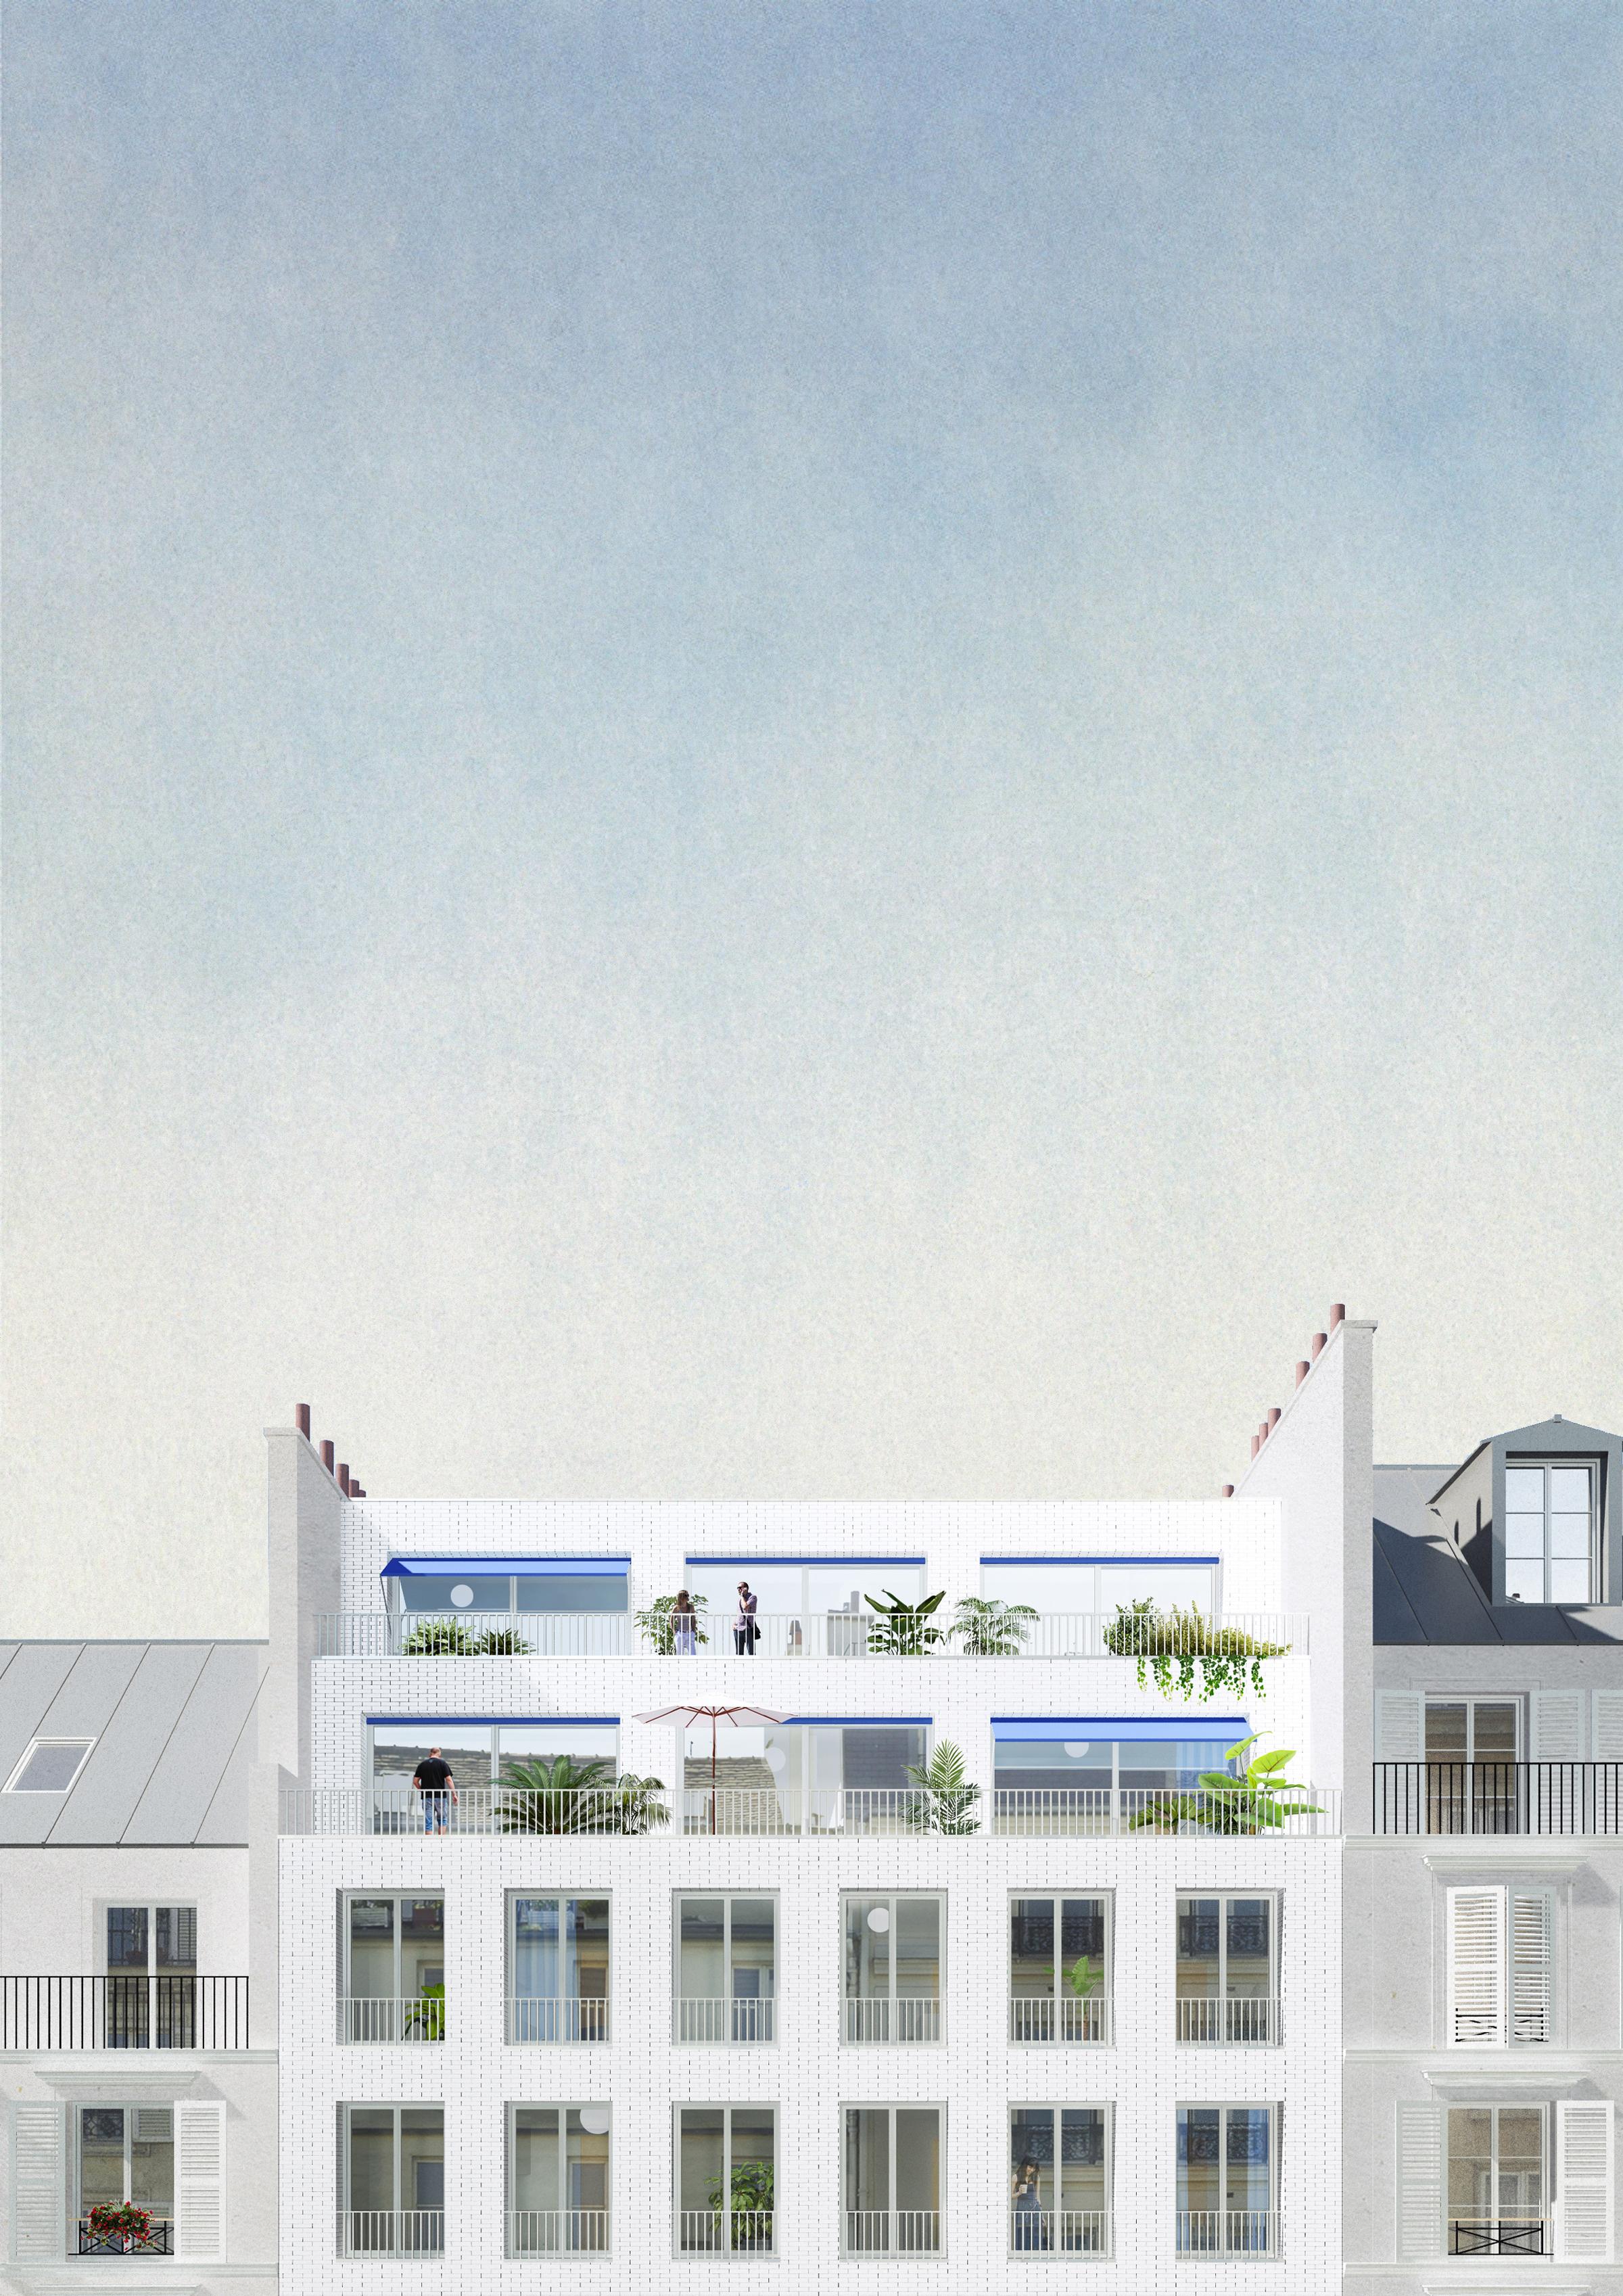 ONCITIES_HOUSING_PARIS_X.jpg